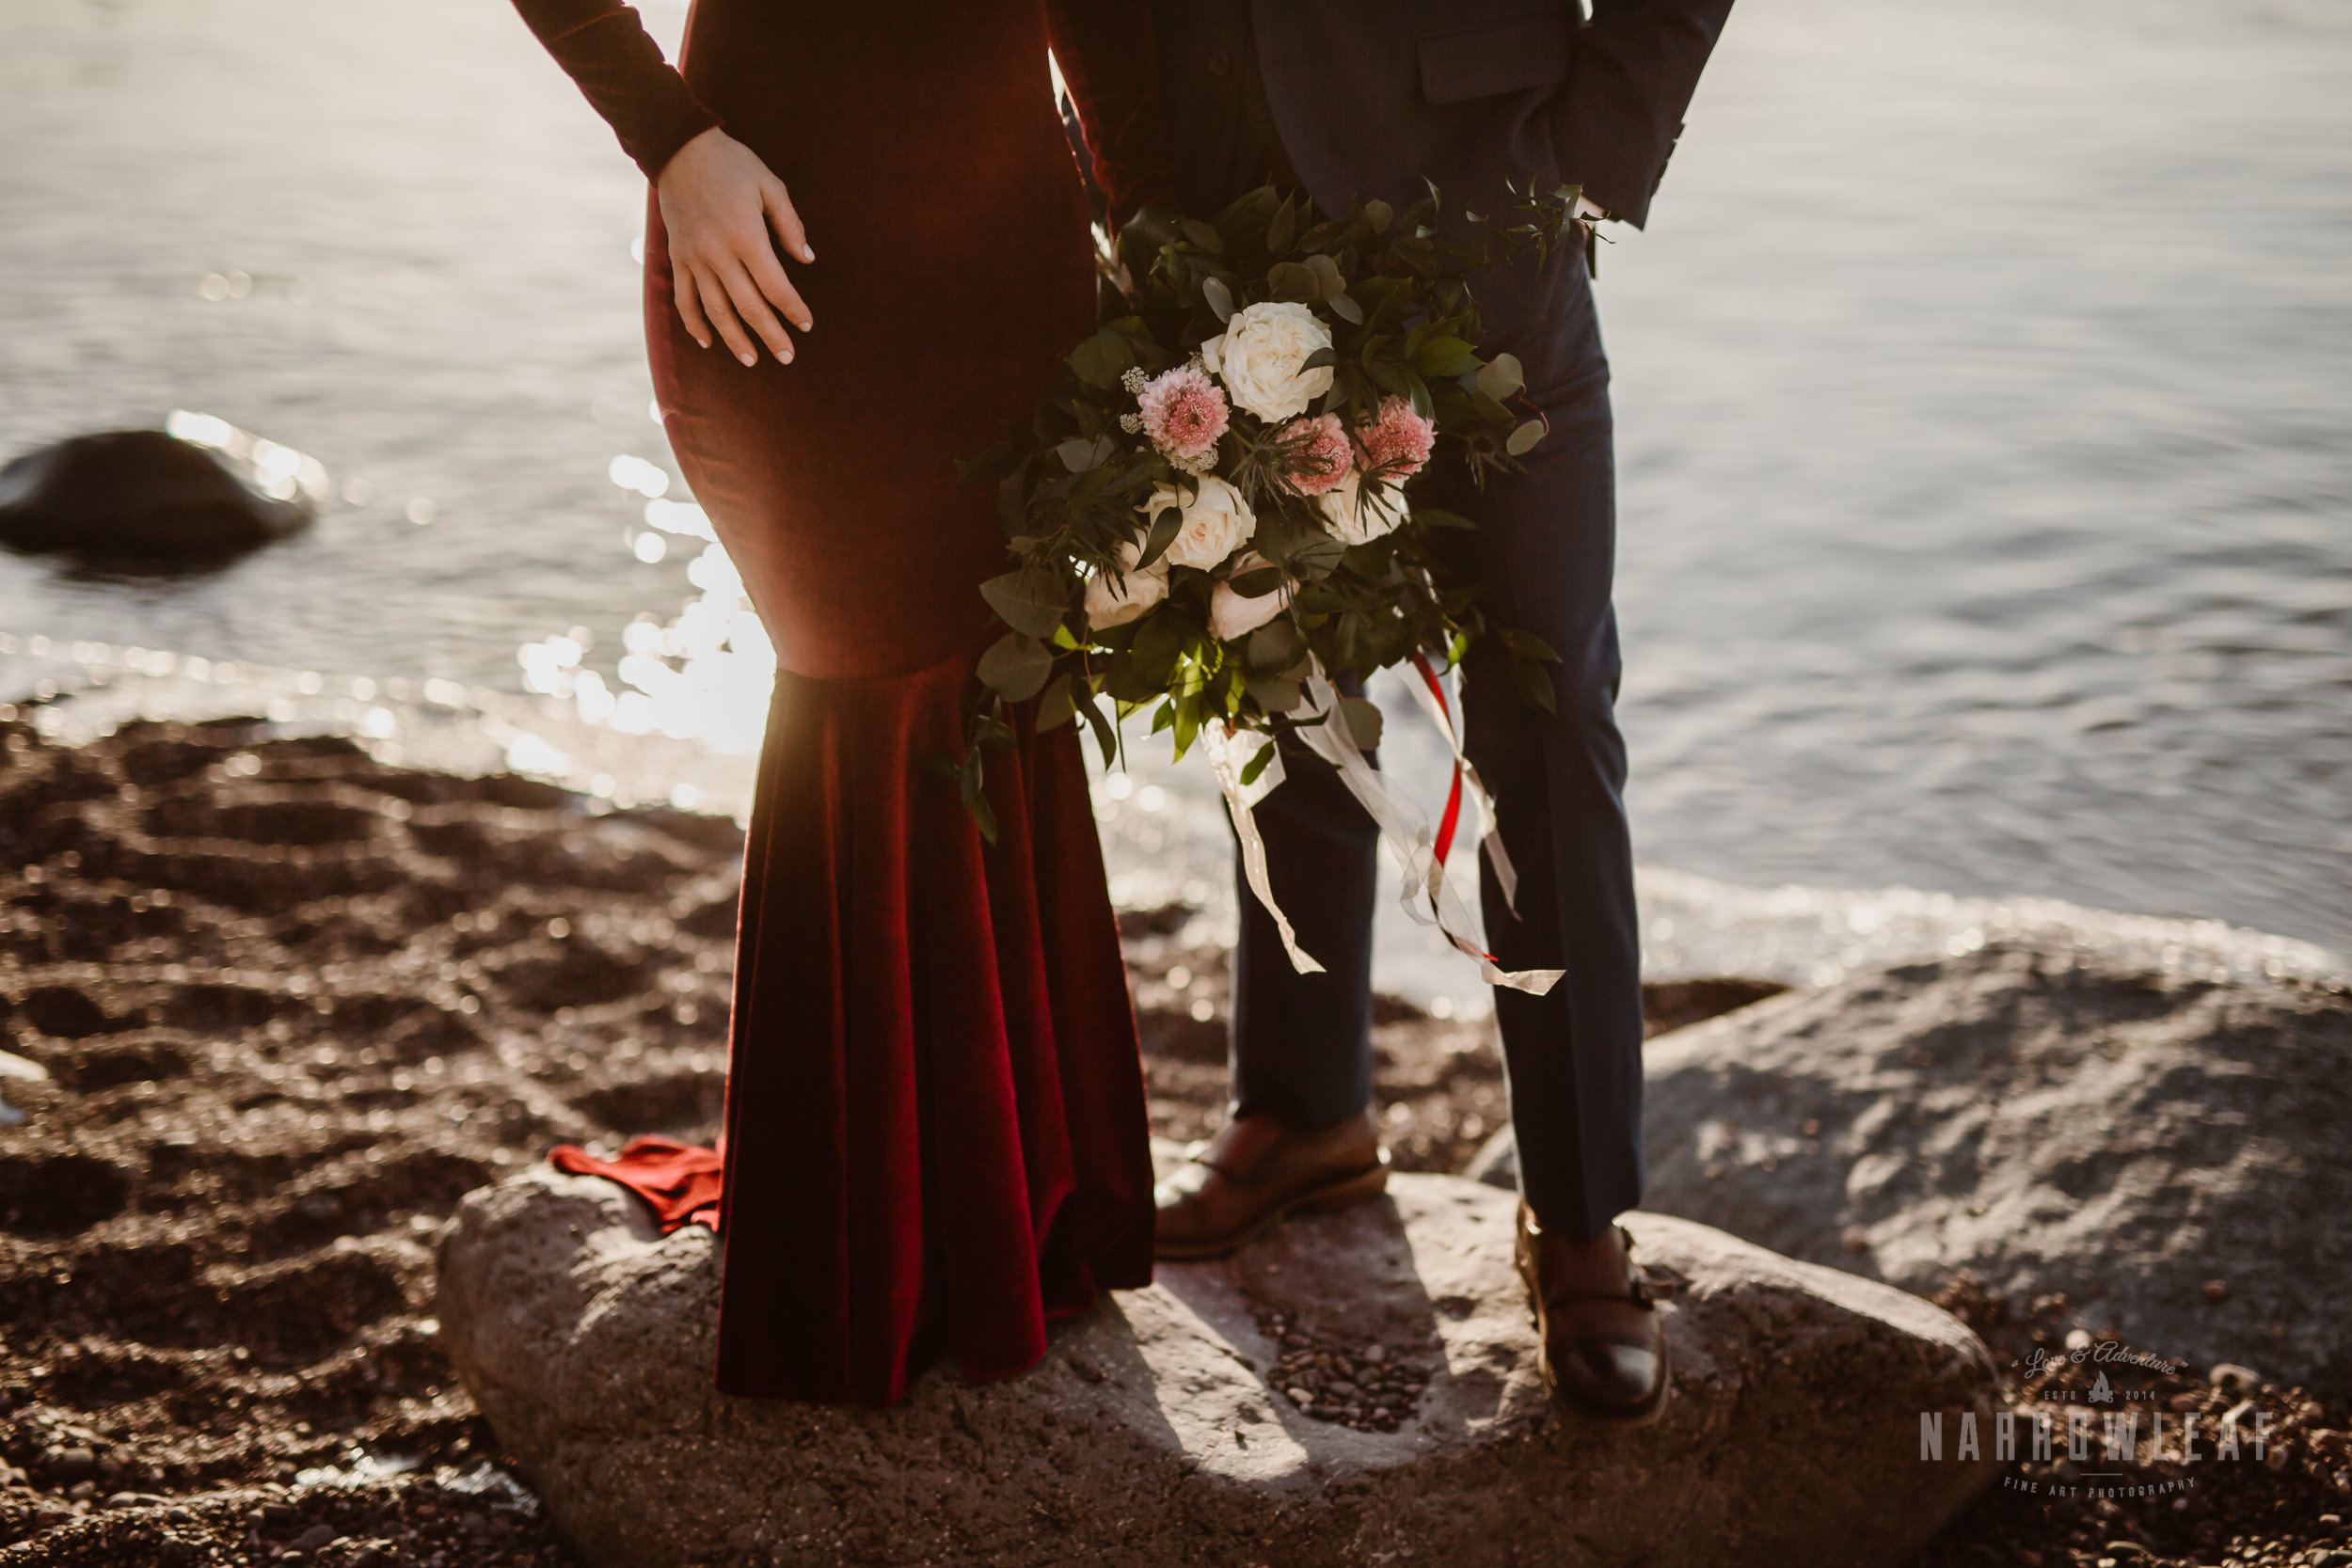 winter-adventure-elopement-tettegouche-state-park-minnesota-Narrowleaf_Love_and_Adventure_Photography-8400.jpg